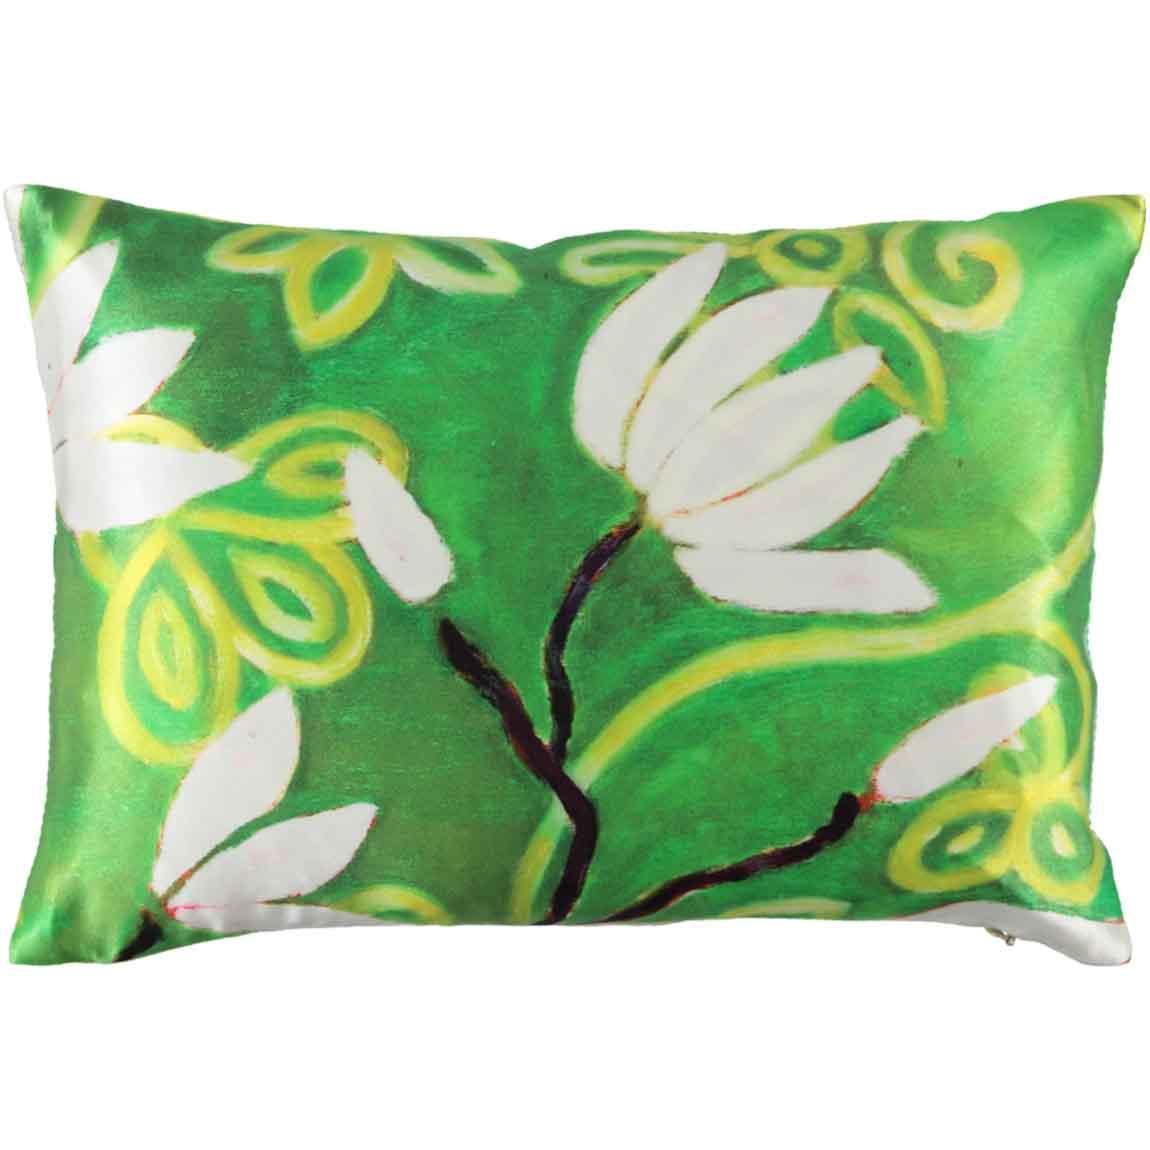 product free hidden silk bath on over orders beauty with pure pillowcase zipper facial shipping overstock pillow luckysilk bedding